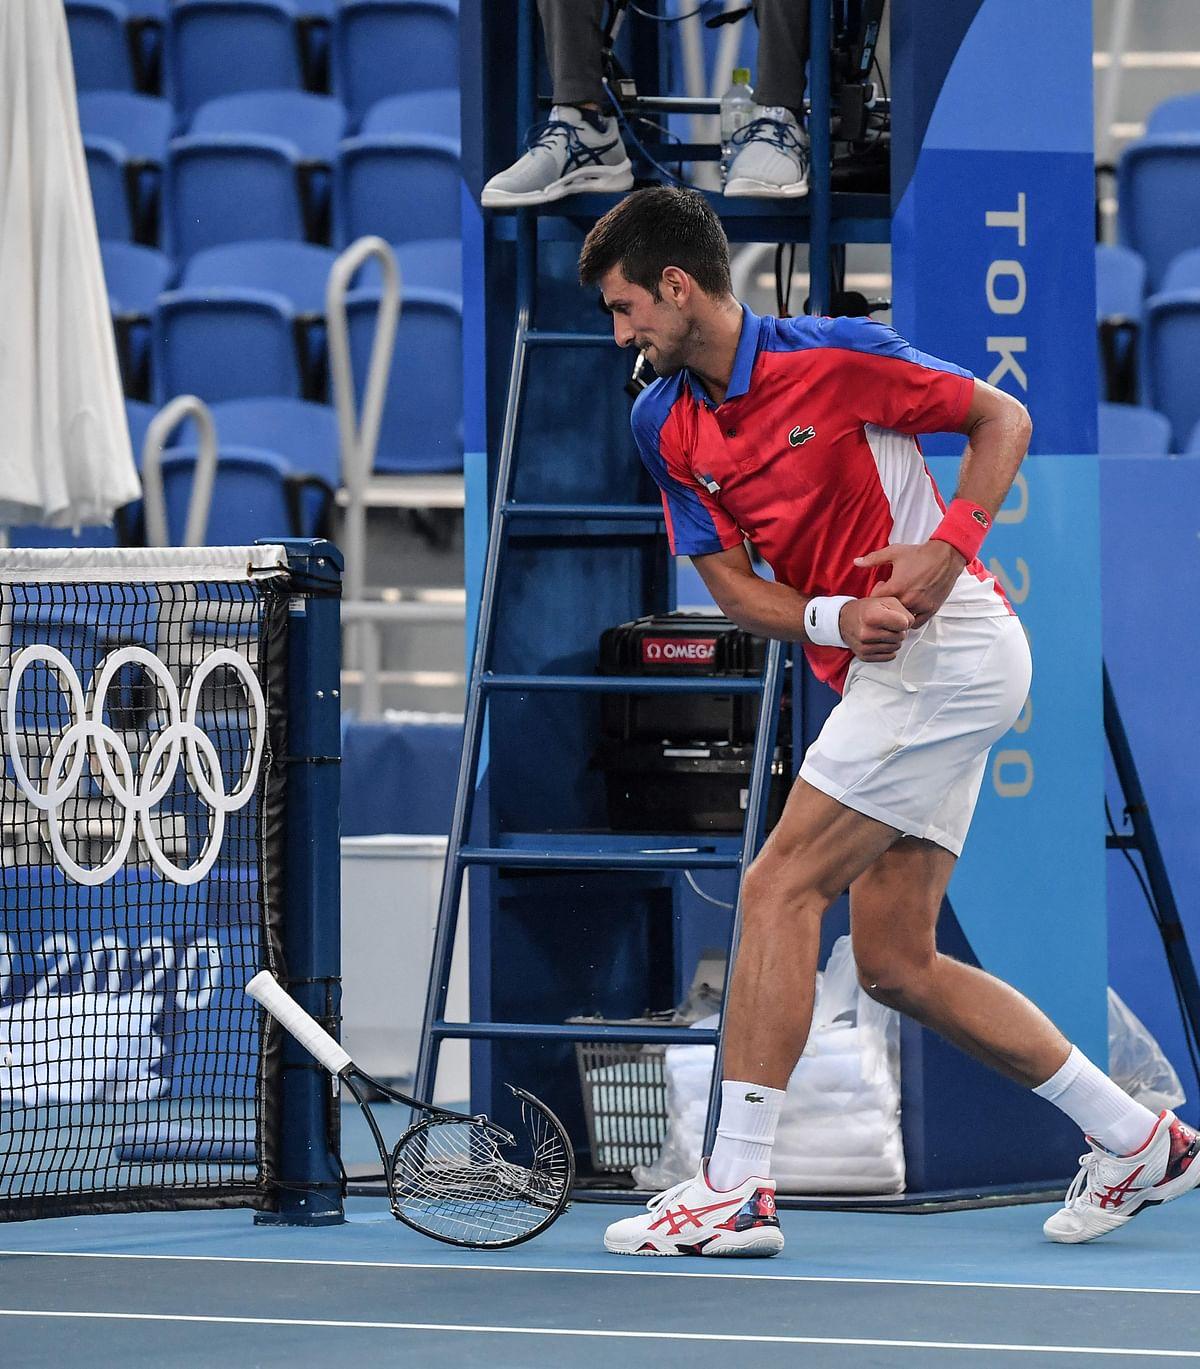 Tokyo Olympics: Djokovic's temper flares, leaves Tokyo empty-handed